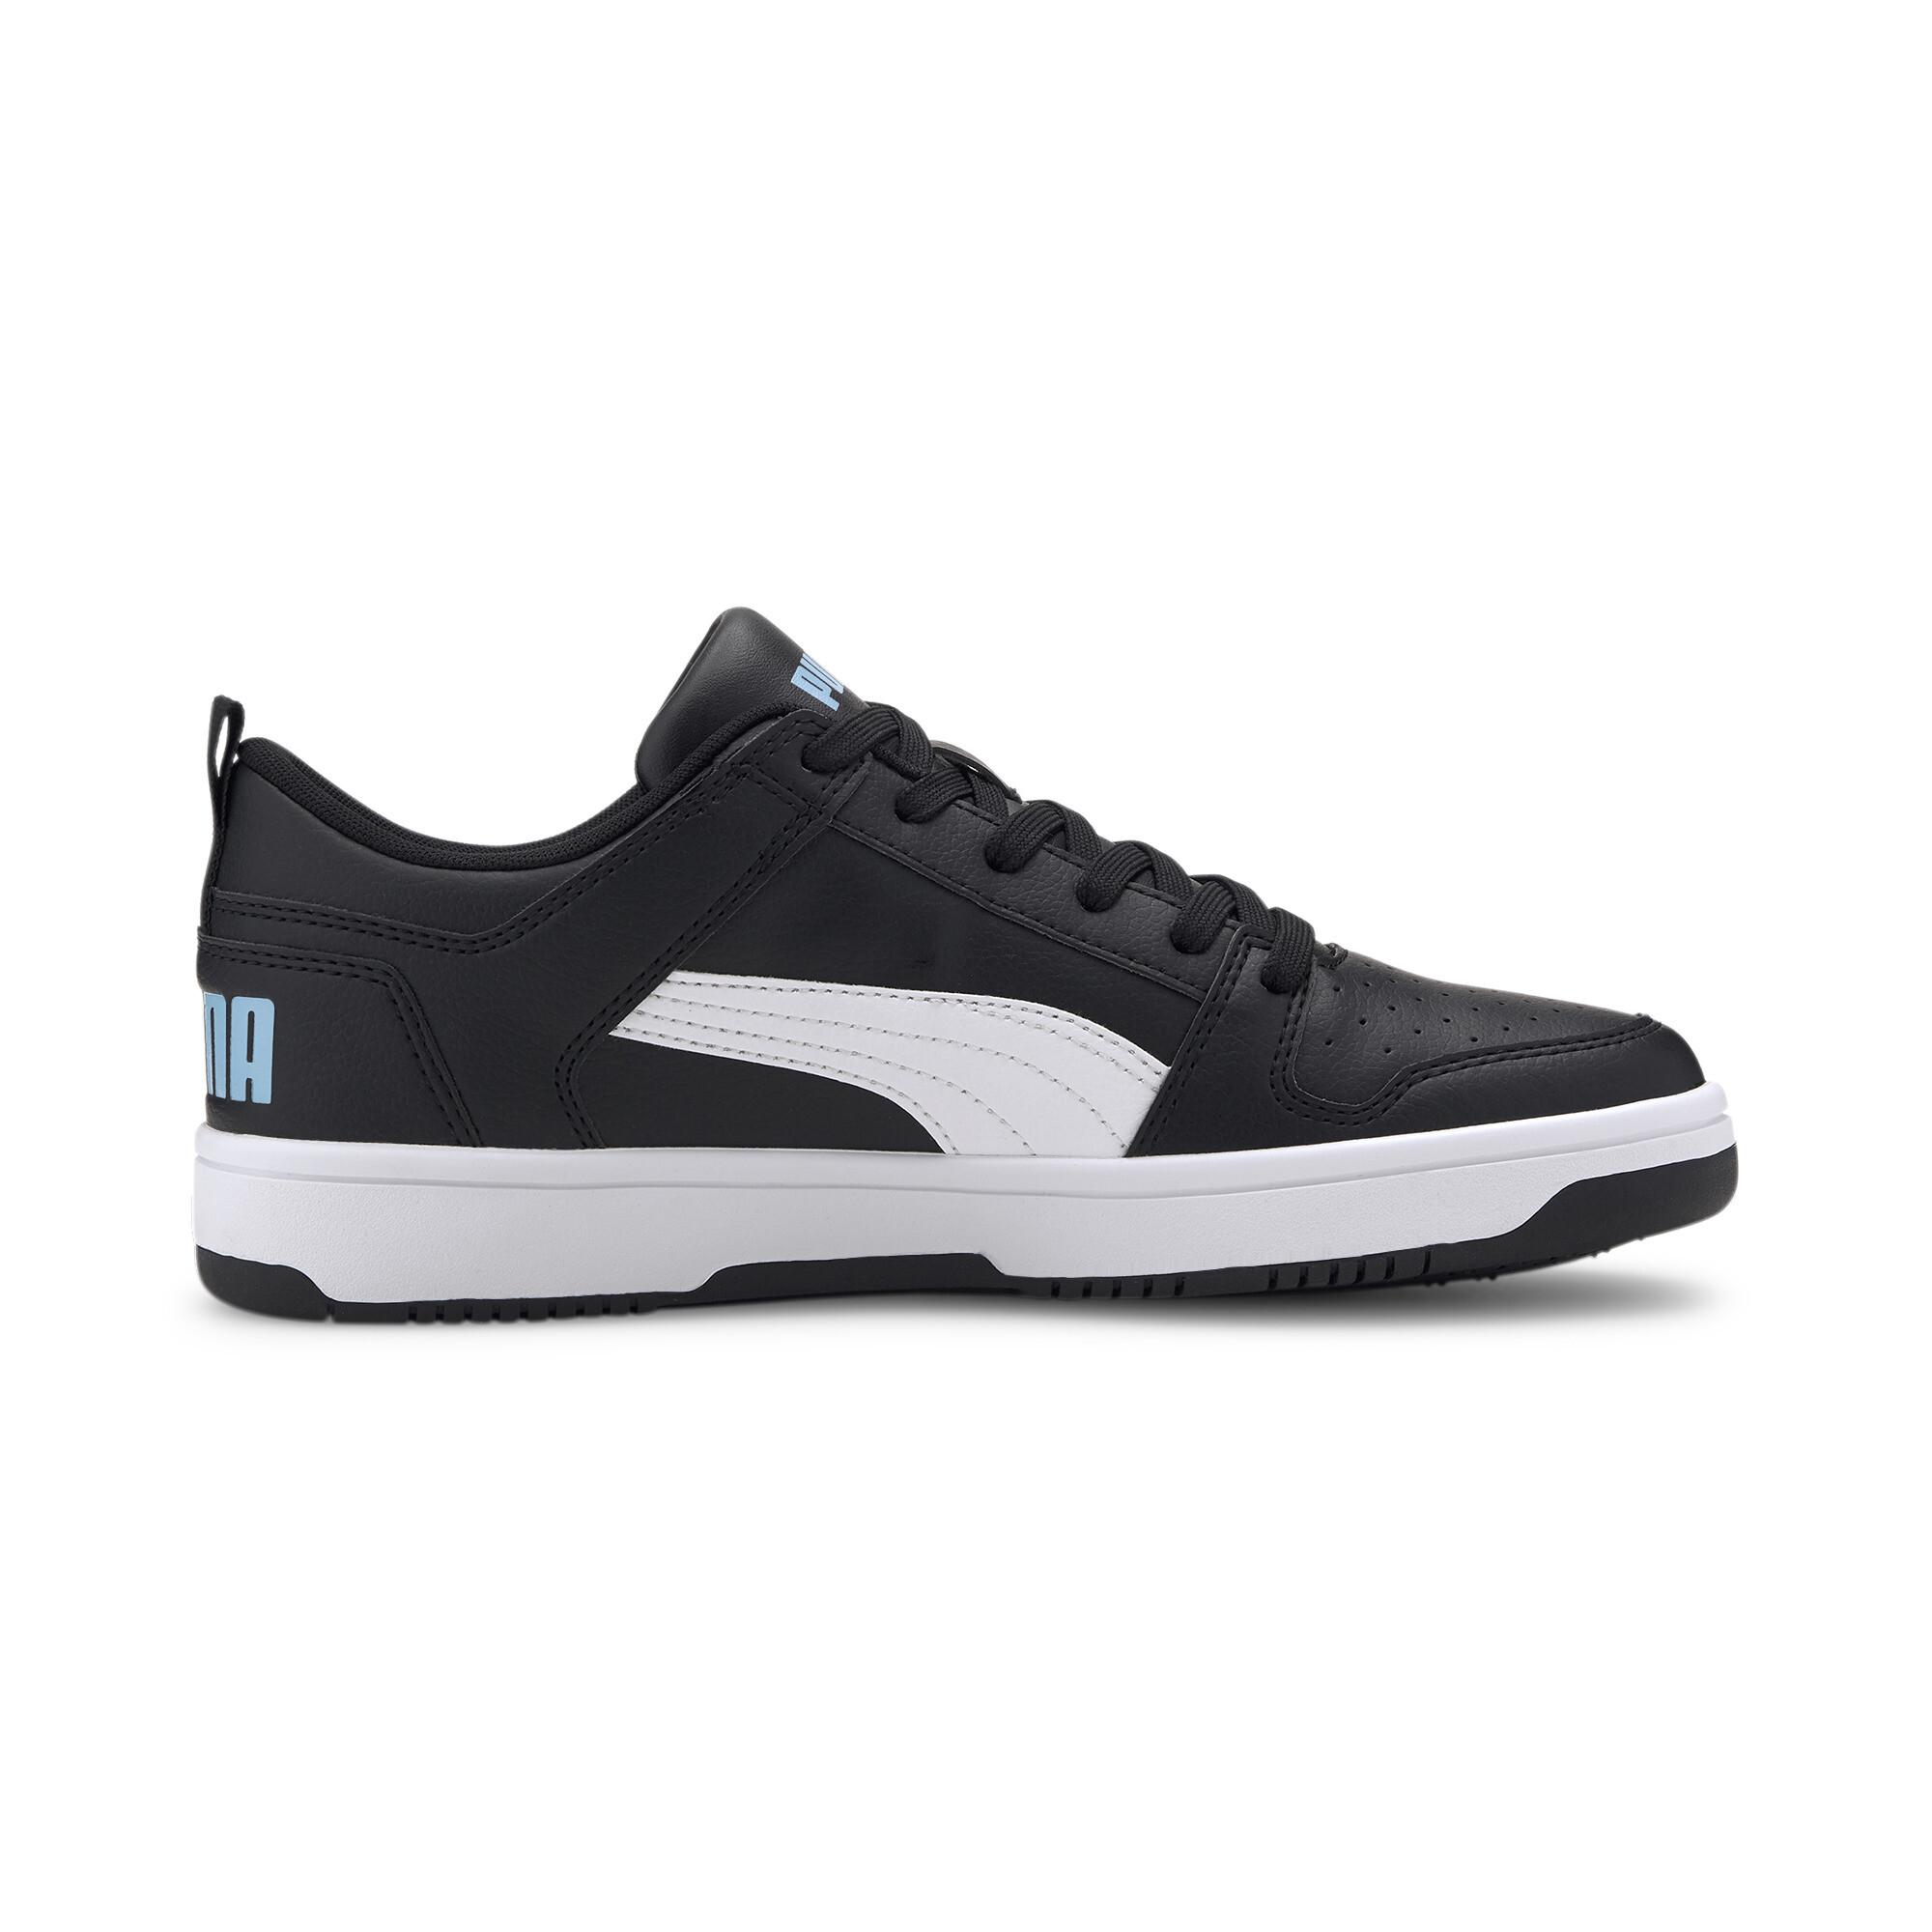 PUMA-PUMA-Rebound-LayUp-Lo-Men-039-s-Sneakers-Men-Shoe-Basics miniatura 25